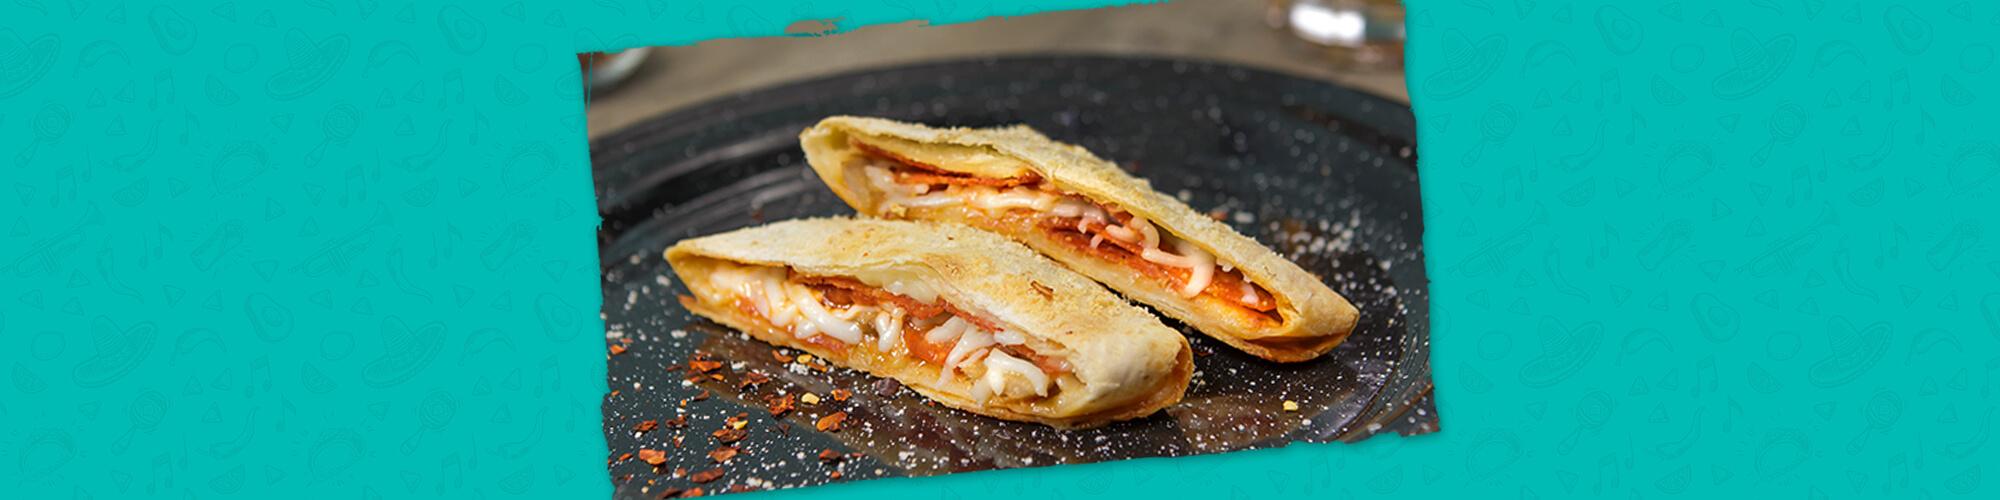 Salsas foldables pocket pepperoni pizza